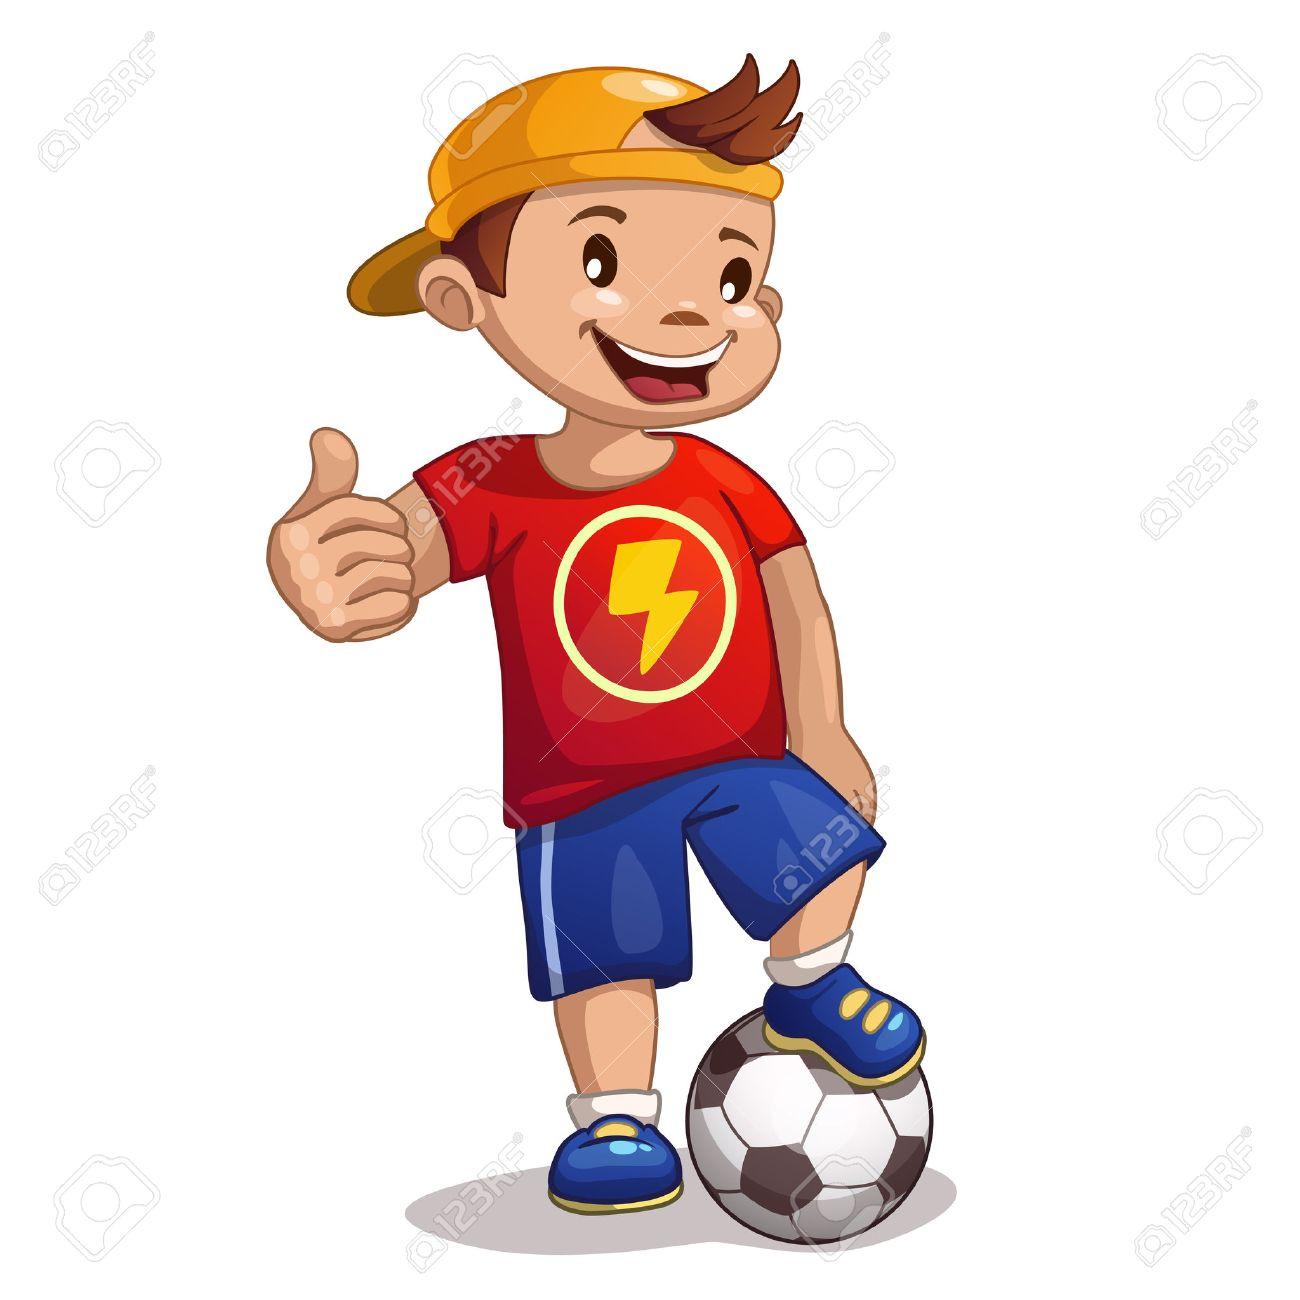 little cartoon boy with ball stock vector 41680442 - Cartoon Boy Images Free